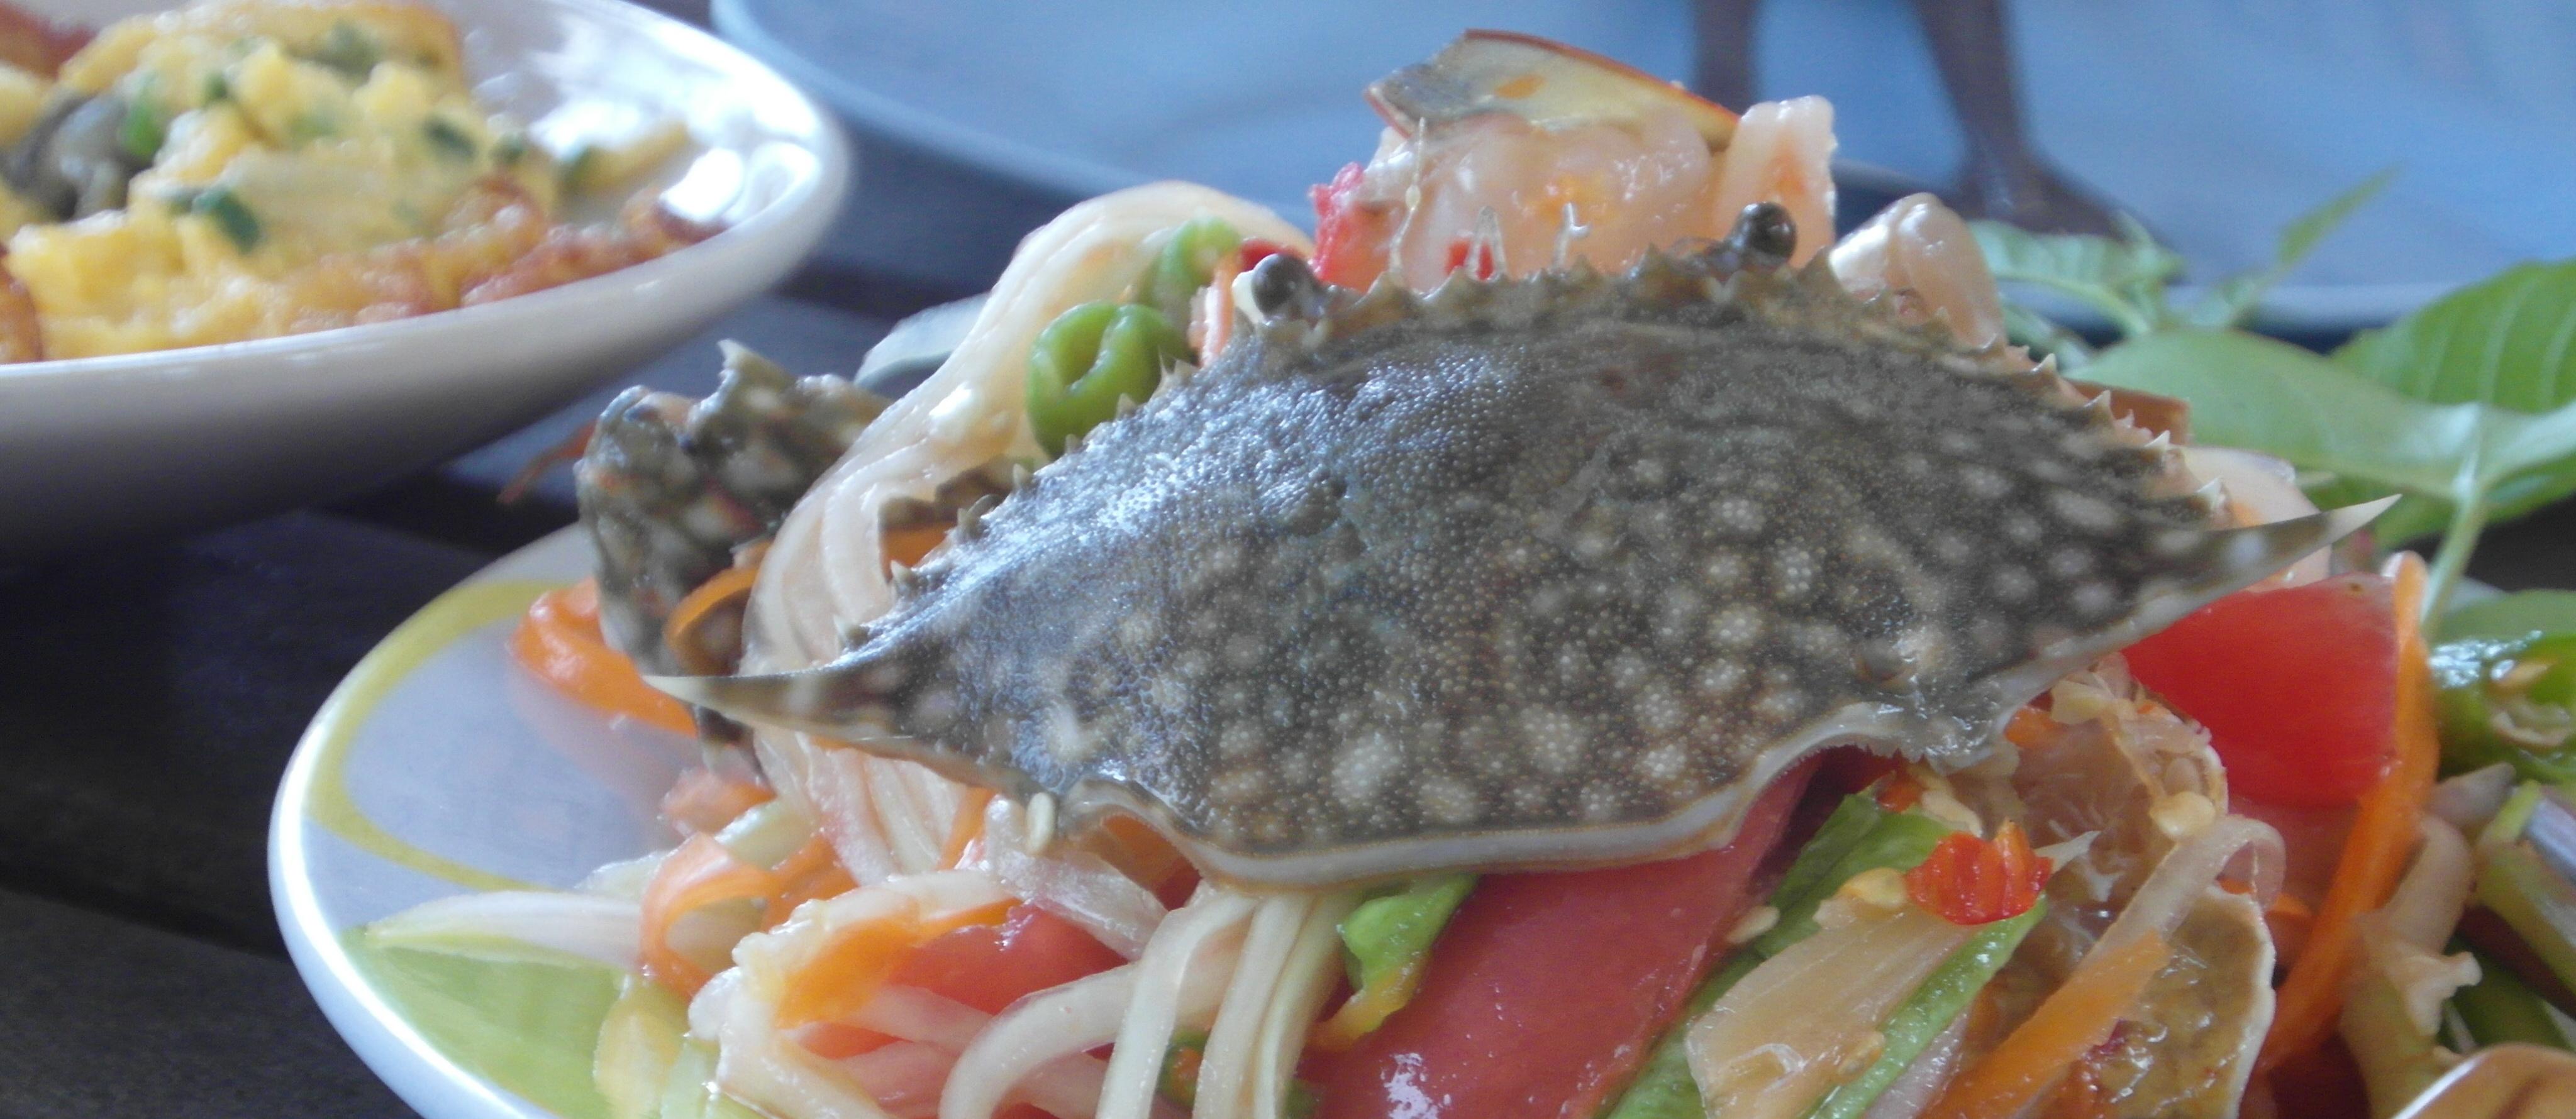 Sushi Crab Salad, Restaurant, Raw, Oriental, Salad, HQ Photo